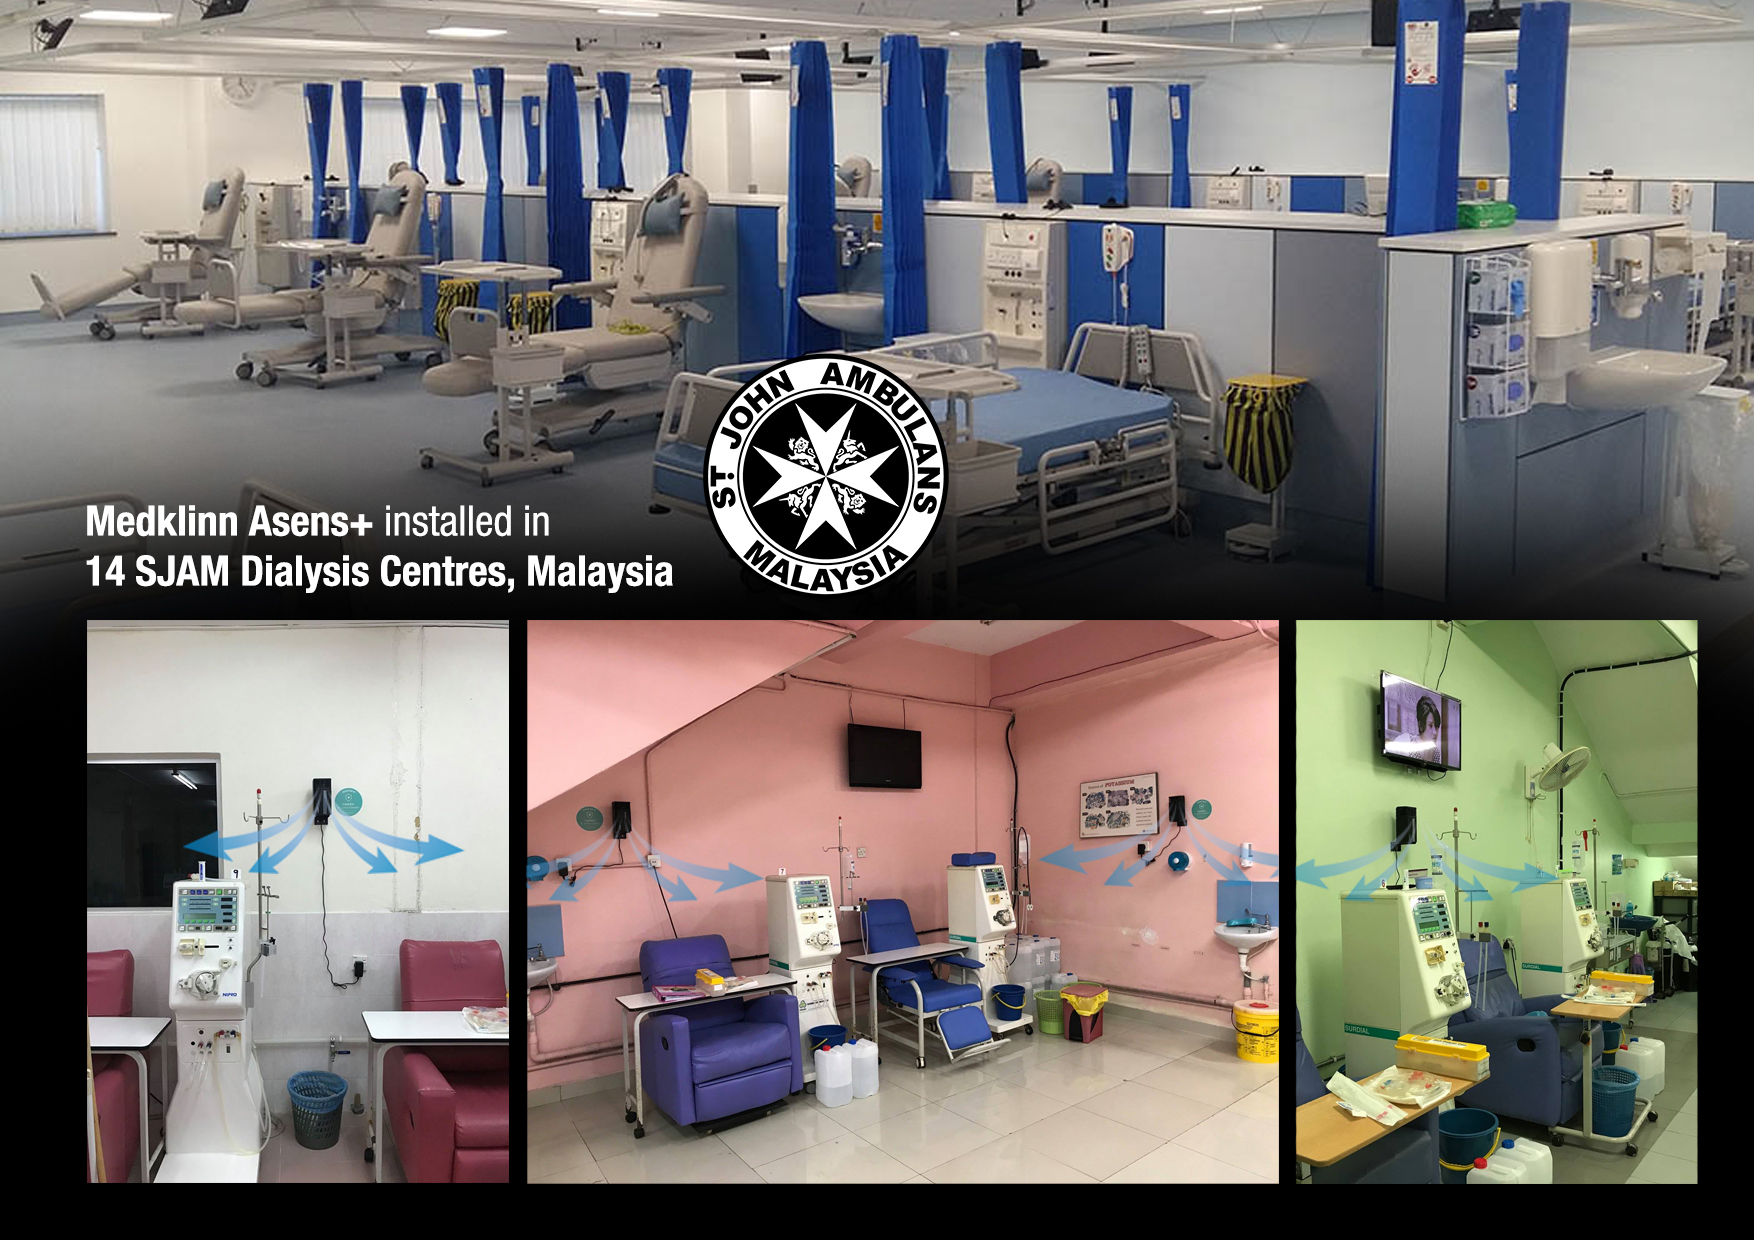 SJAM Dialysis Centres